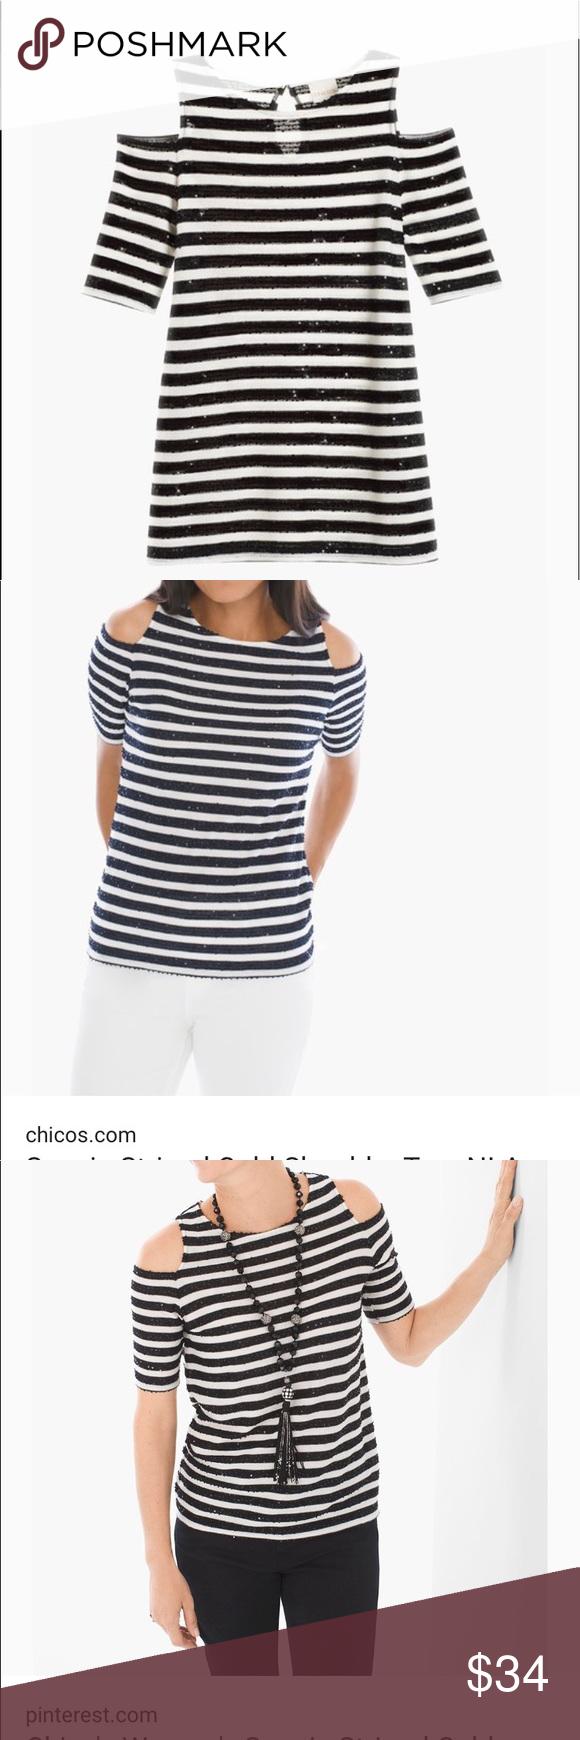 e891dcfb01dde NEW CHICOS. Shiny sequin cold shoulder top NEW CHICOS shiny sequin stripe cold  shoulder top